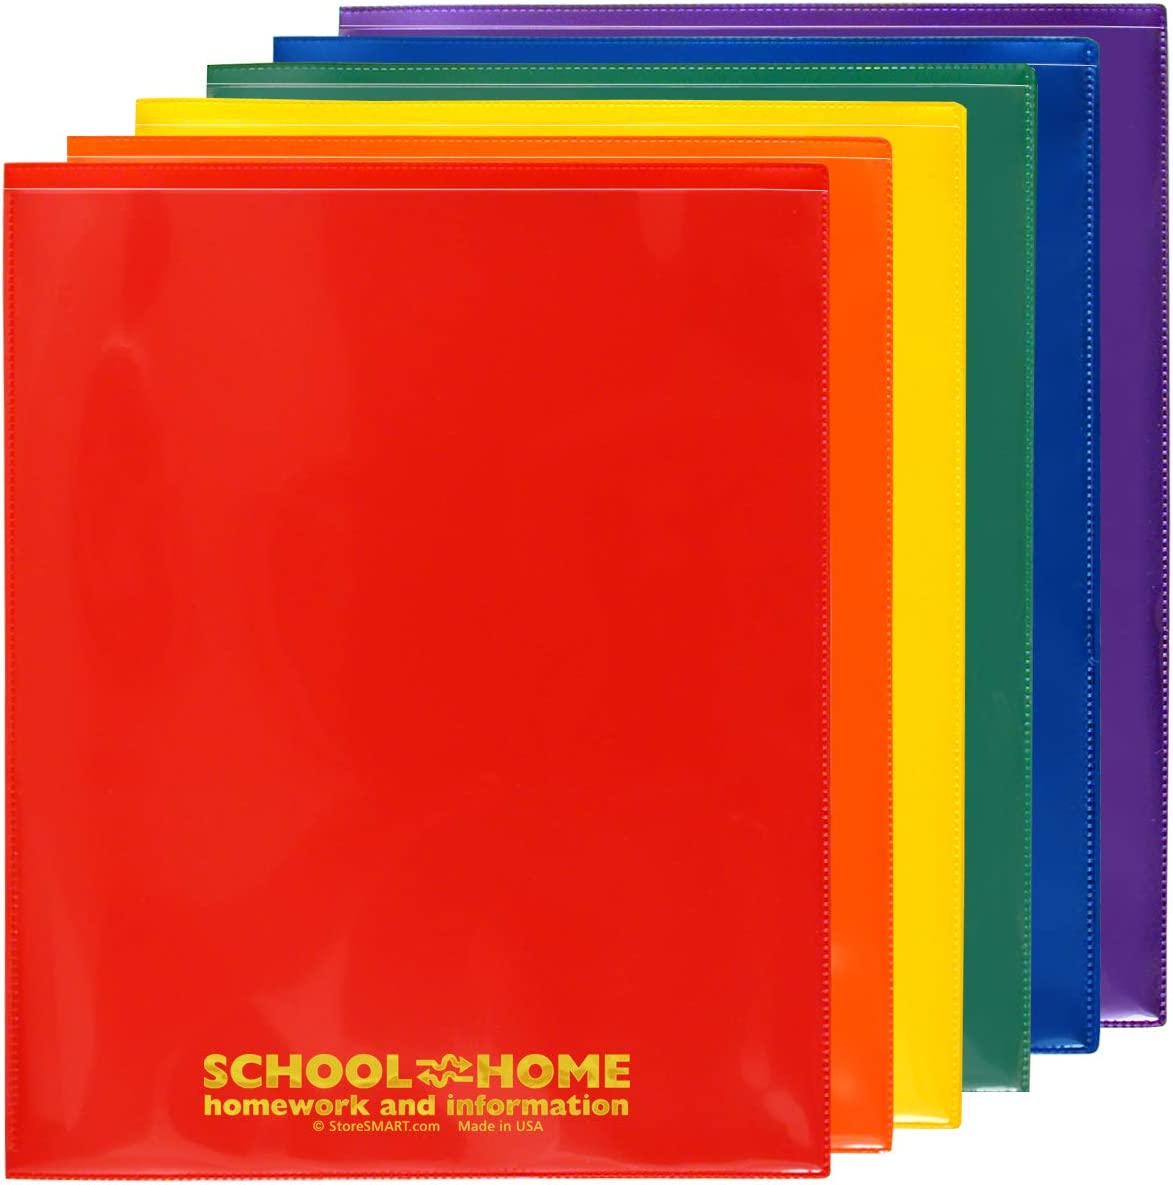 StoreSMART School/Home Folders - 6-Pack - 6 Colors! - Letter-Size Twin Pocket - Durable, Archival Plastic - SH900PCP6ENG